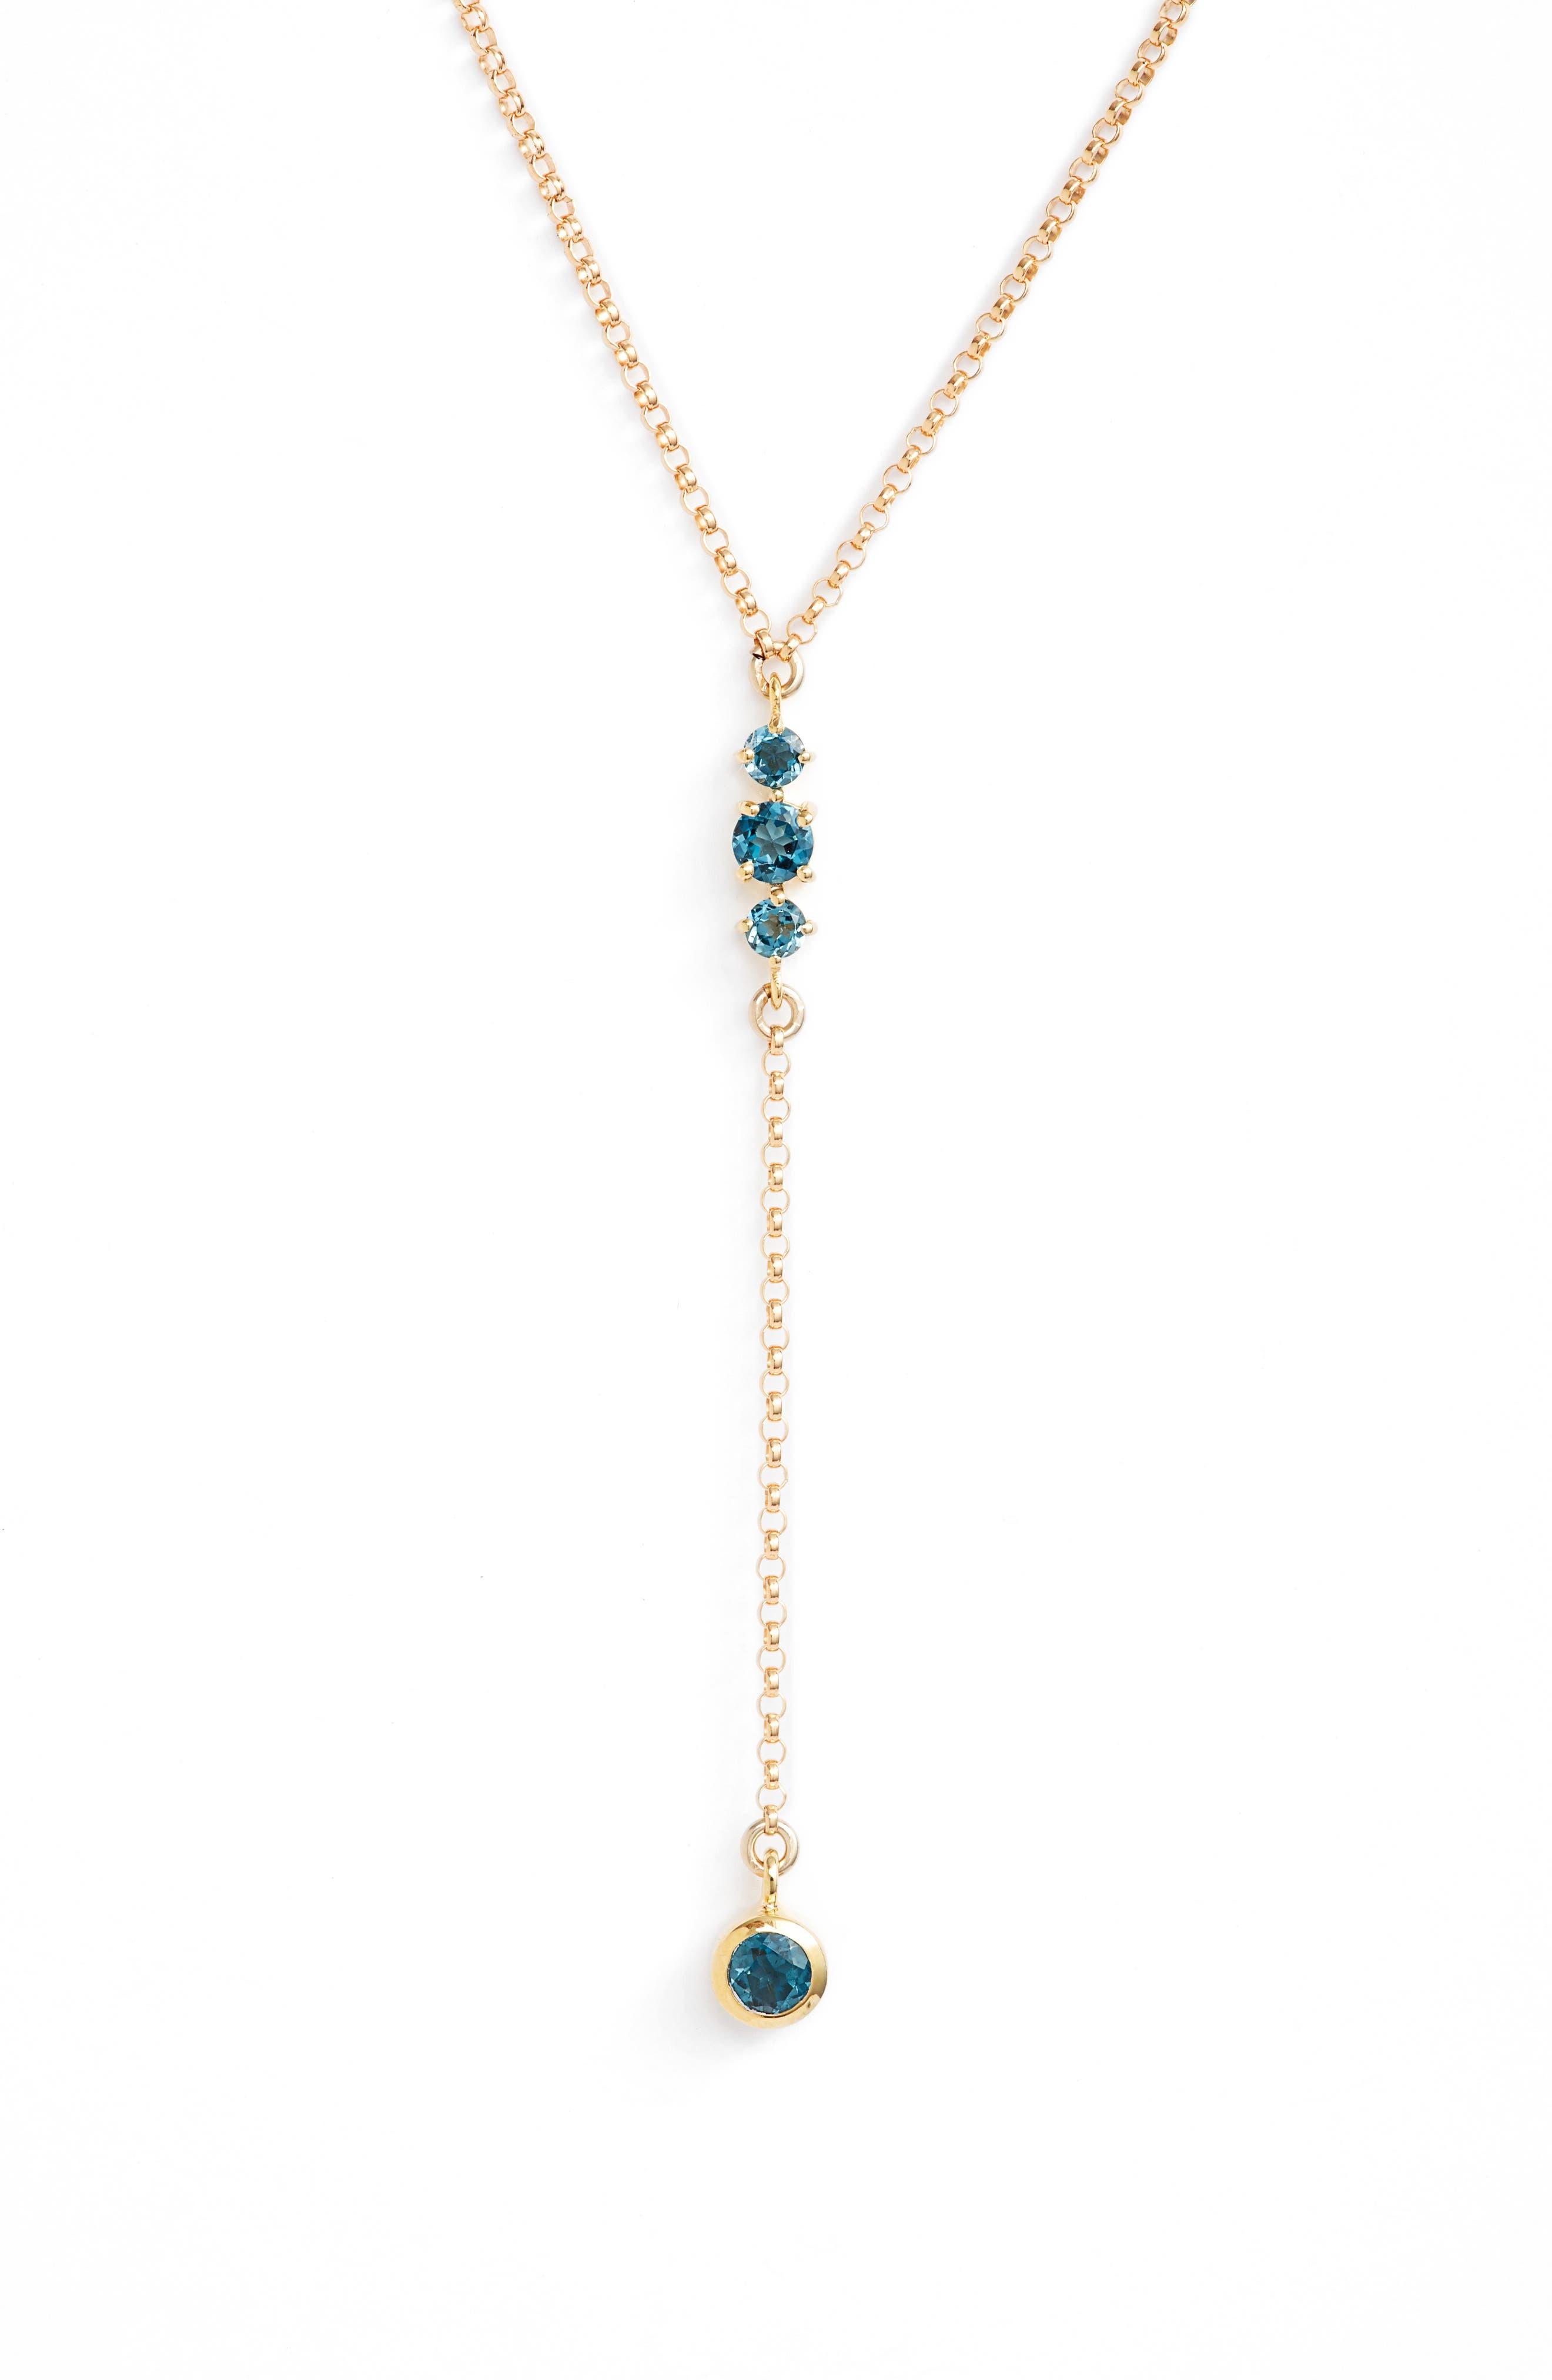 Main Image - Leah Alexandra Moonstone & Gold Y-Necklace